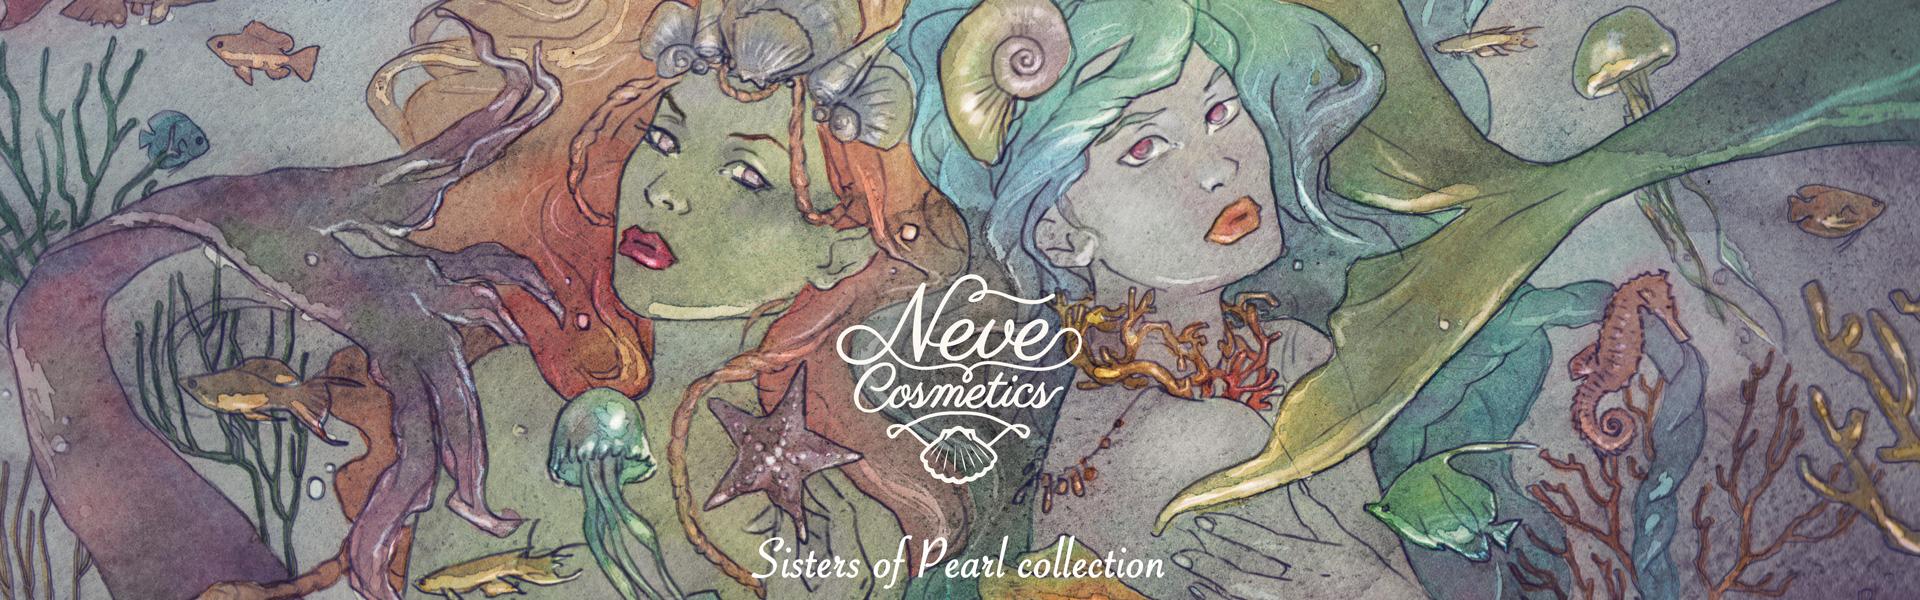 Neve Cosmetics presenta: Sisters Of Pearl